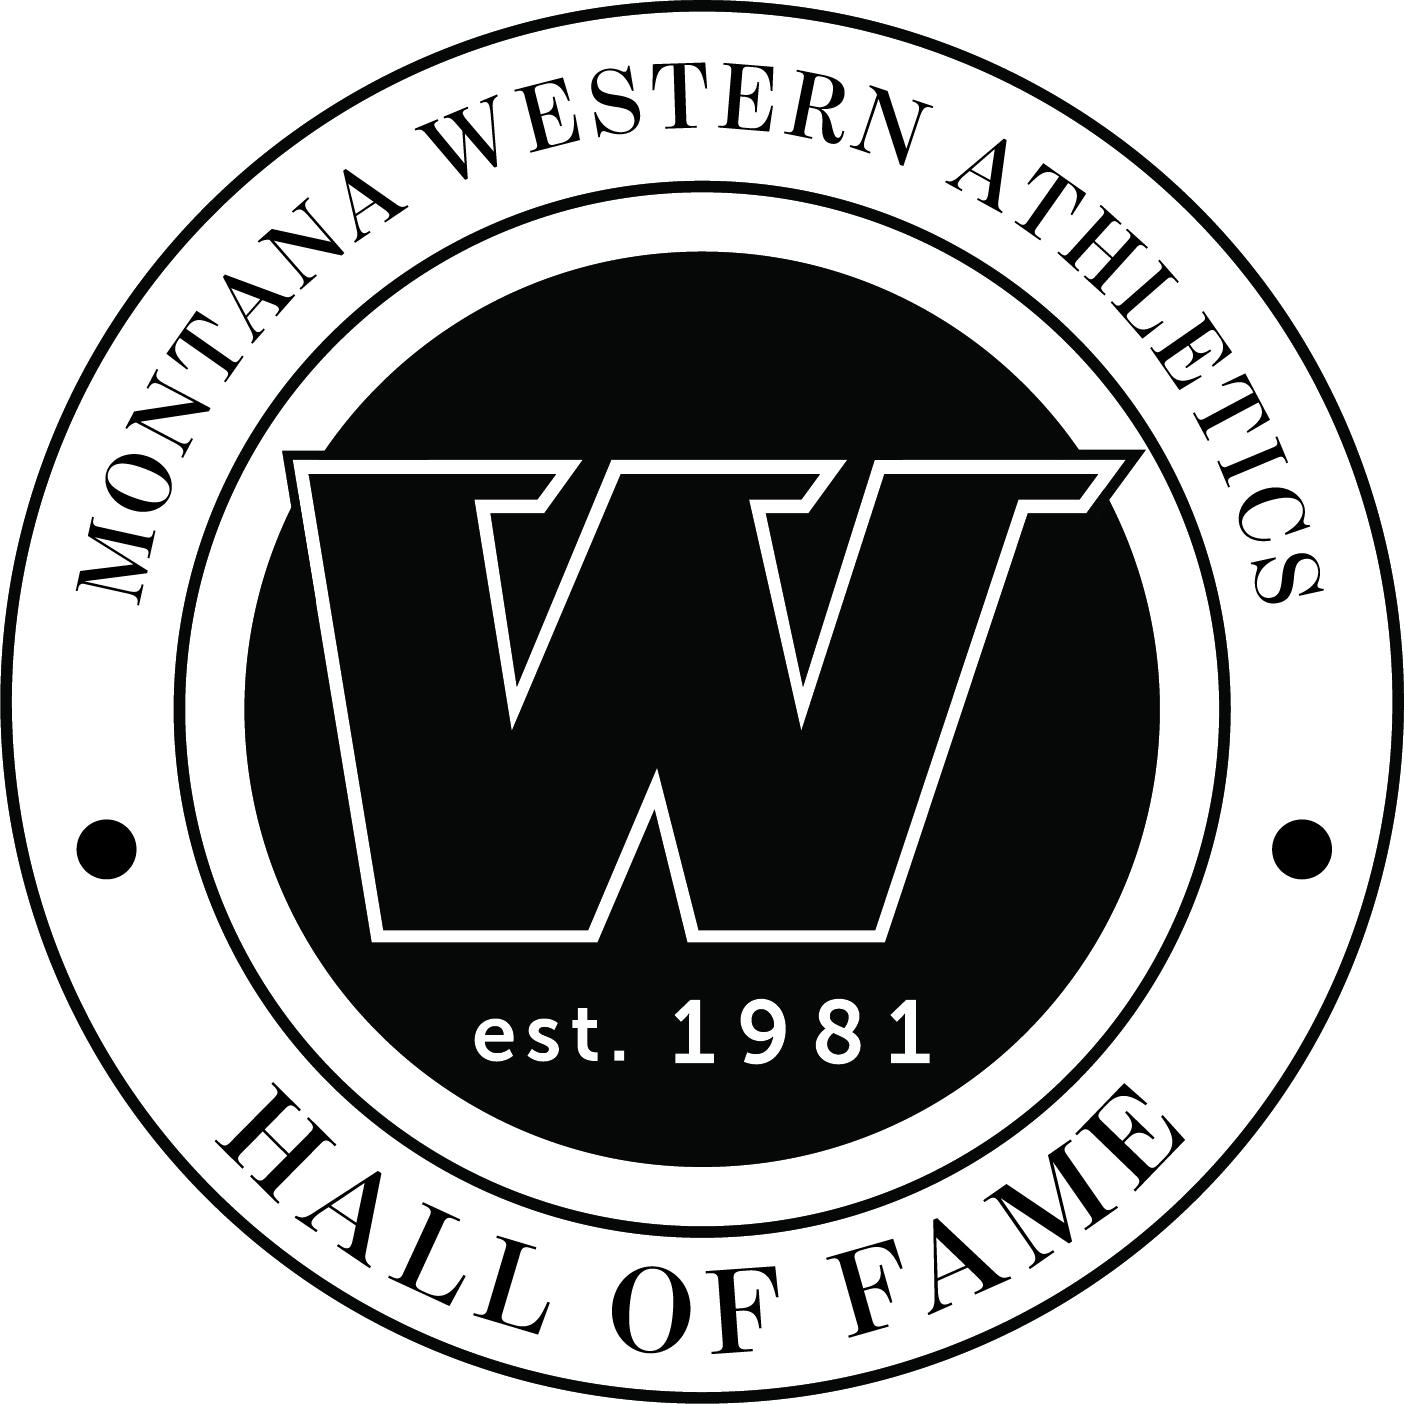 Bulldog Athletics Hall of Fame Brunch Induction Ceremony